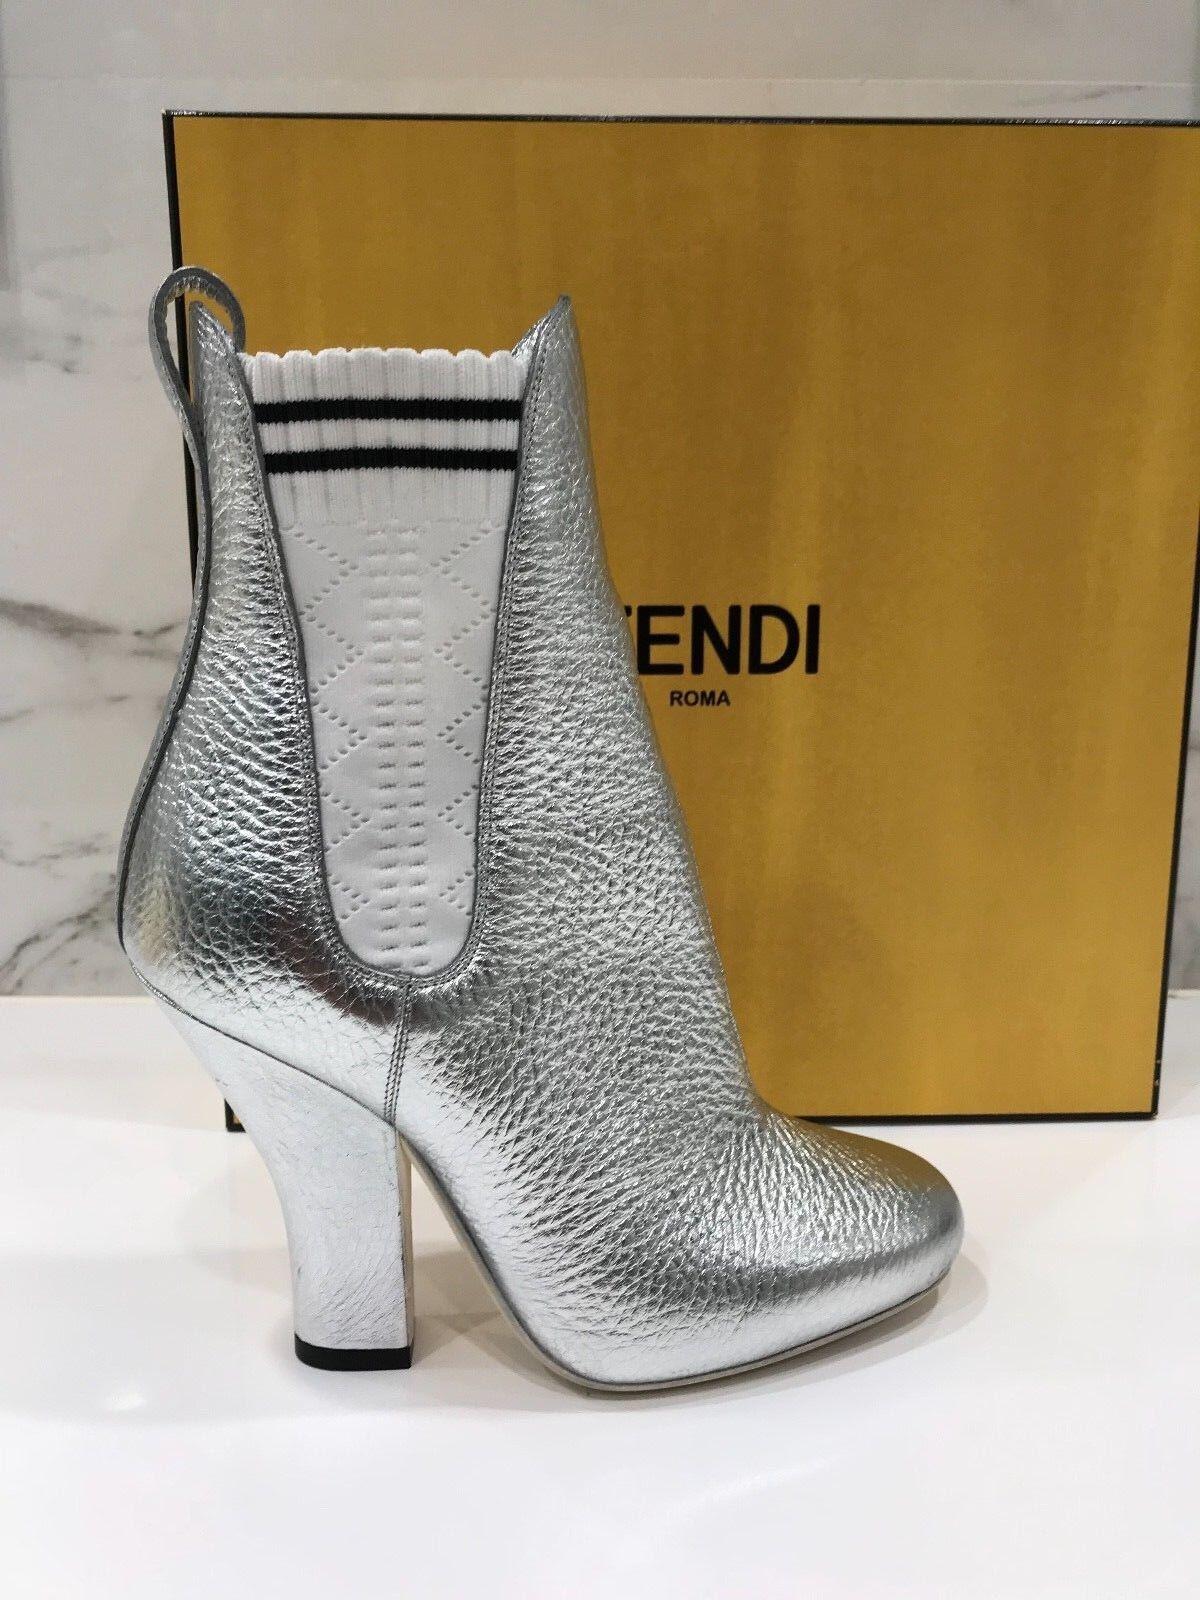 New Fendi Metallic Grained Leather Elastic Black White Chelsea Booties 40 $1050